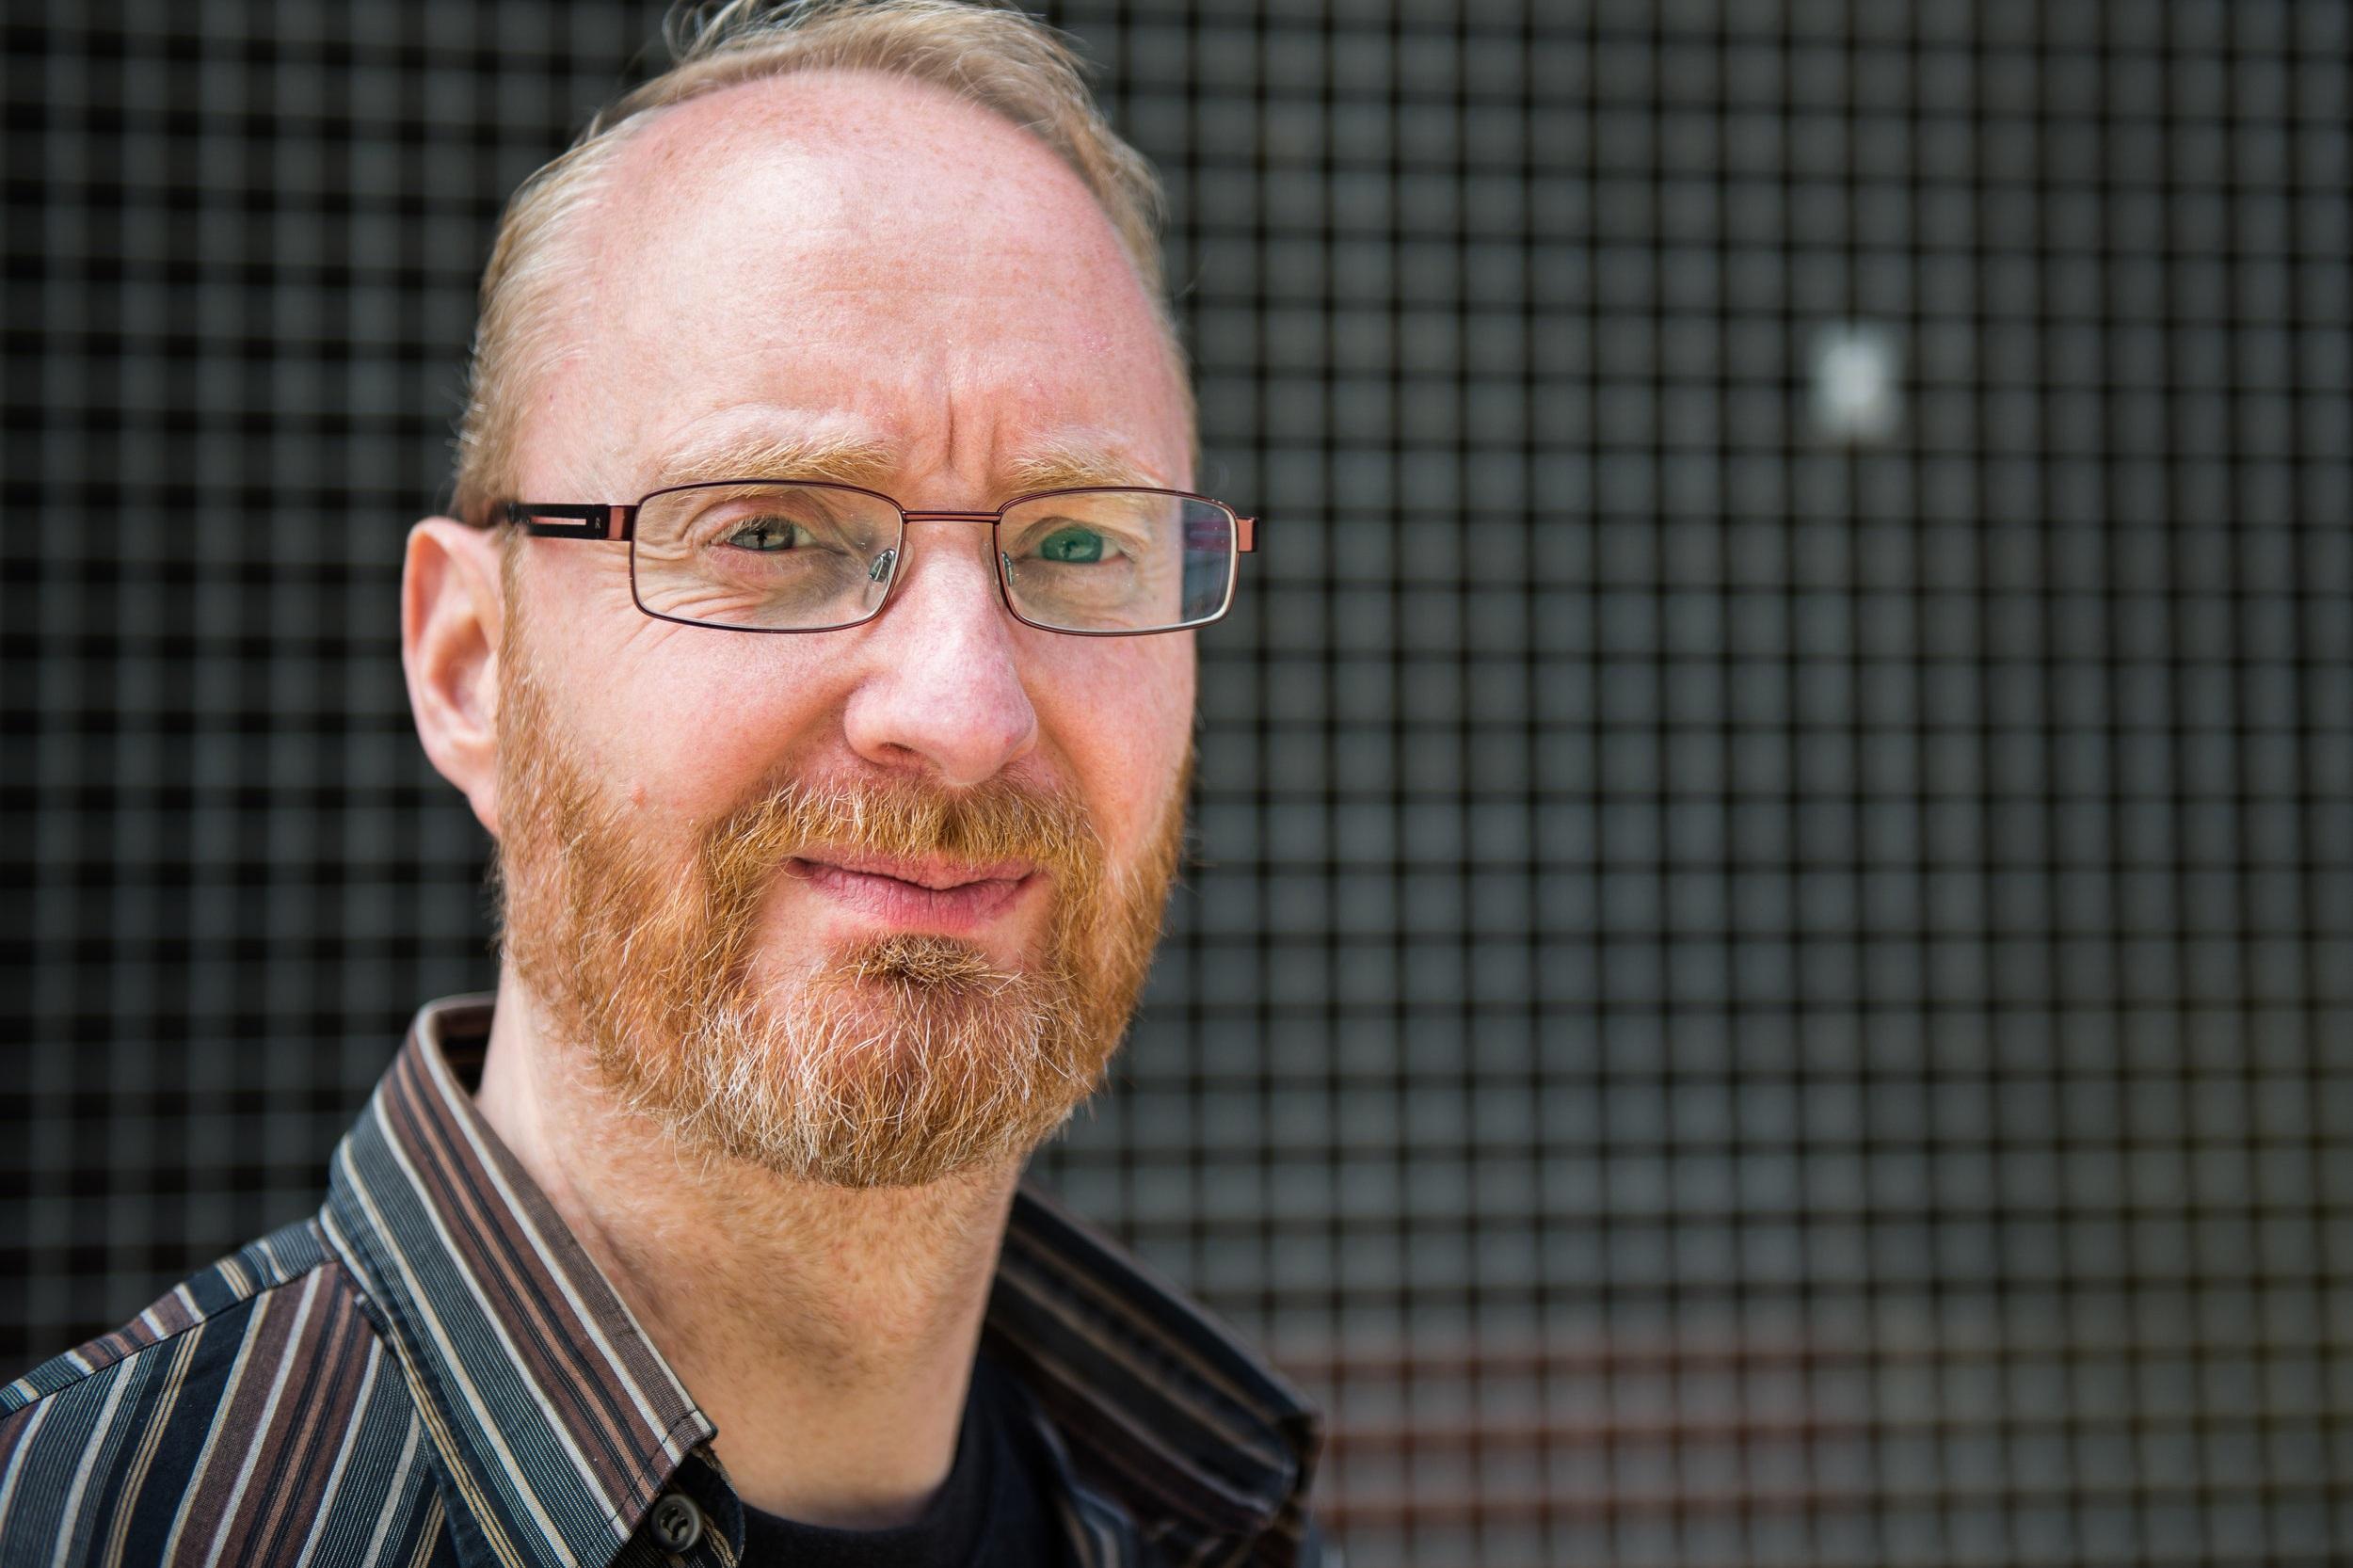 WALTER HOEIJMAKERS - Roadburn Festival Artistic Director